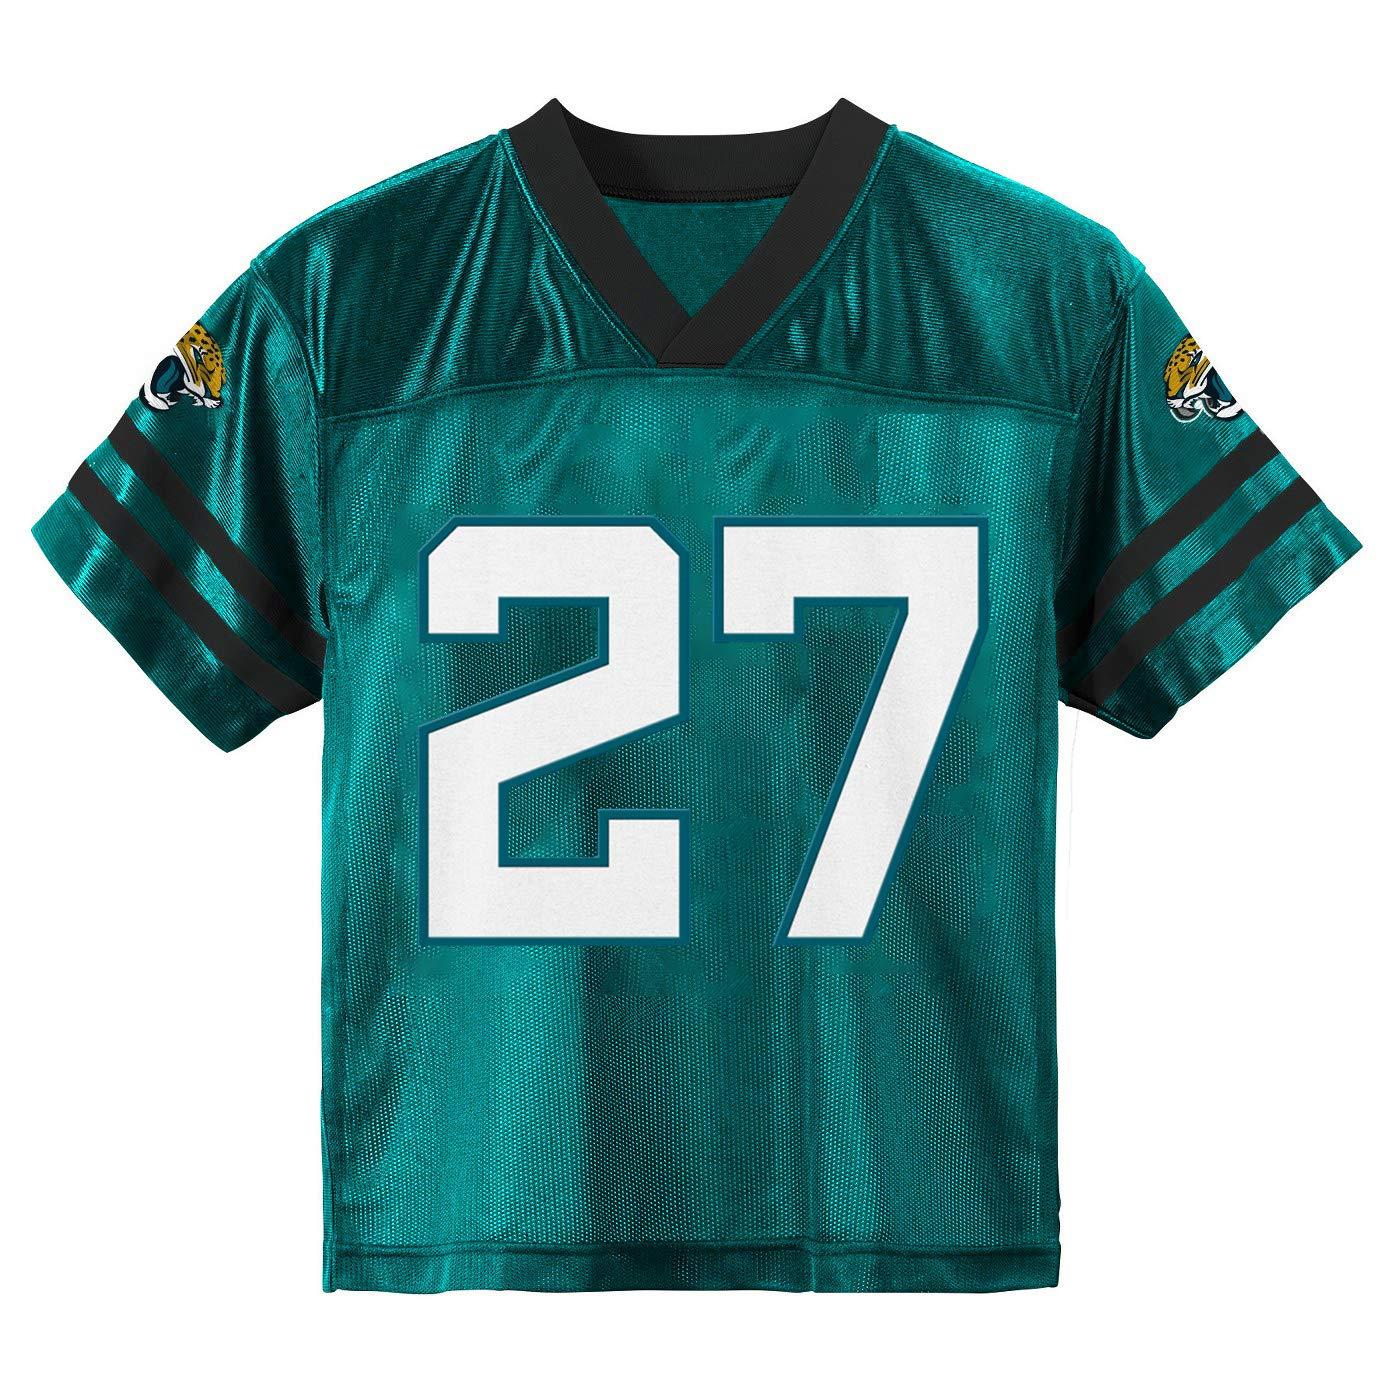 cb7af39bb Amazon.com   Outerstuff Leonard Fournette Jacksonville Jaguars  27 Teal  Youth Alternate Player Jersey   Sports   Outdoors